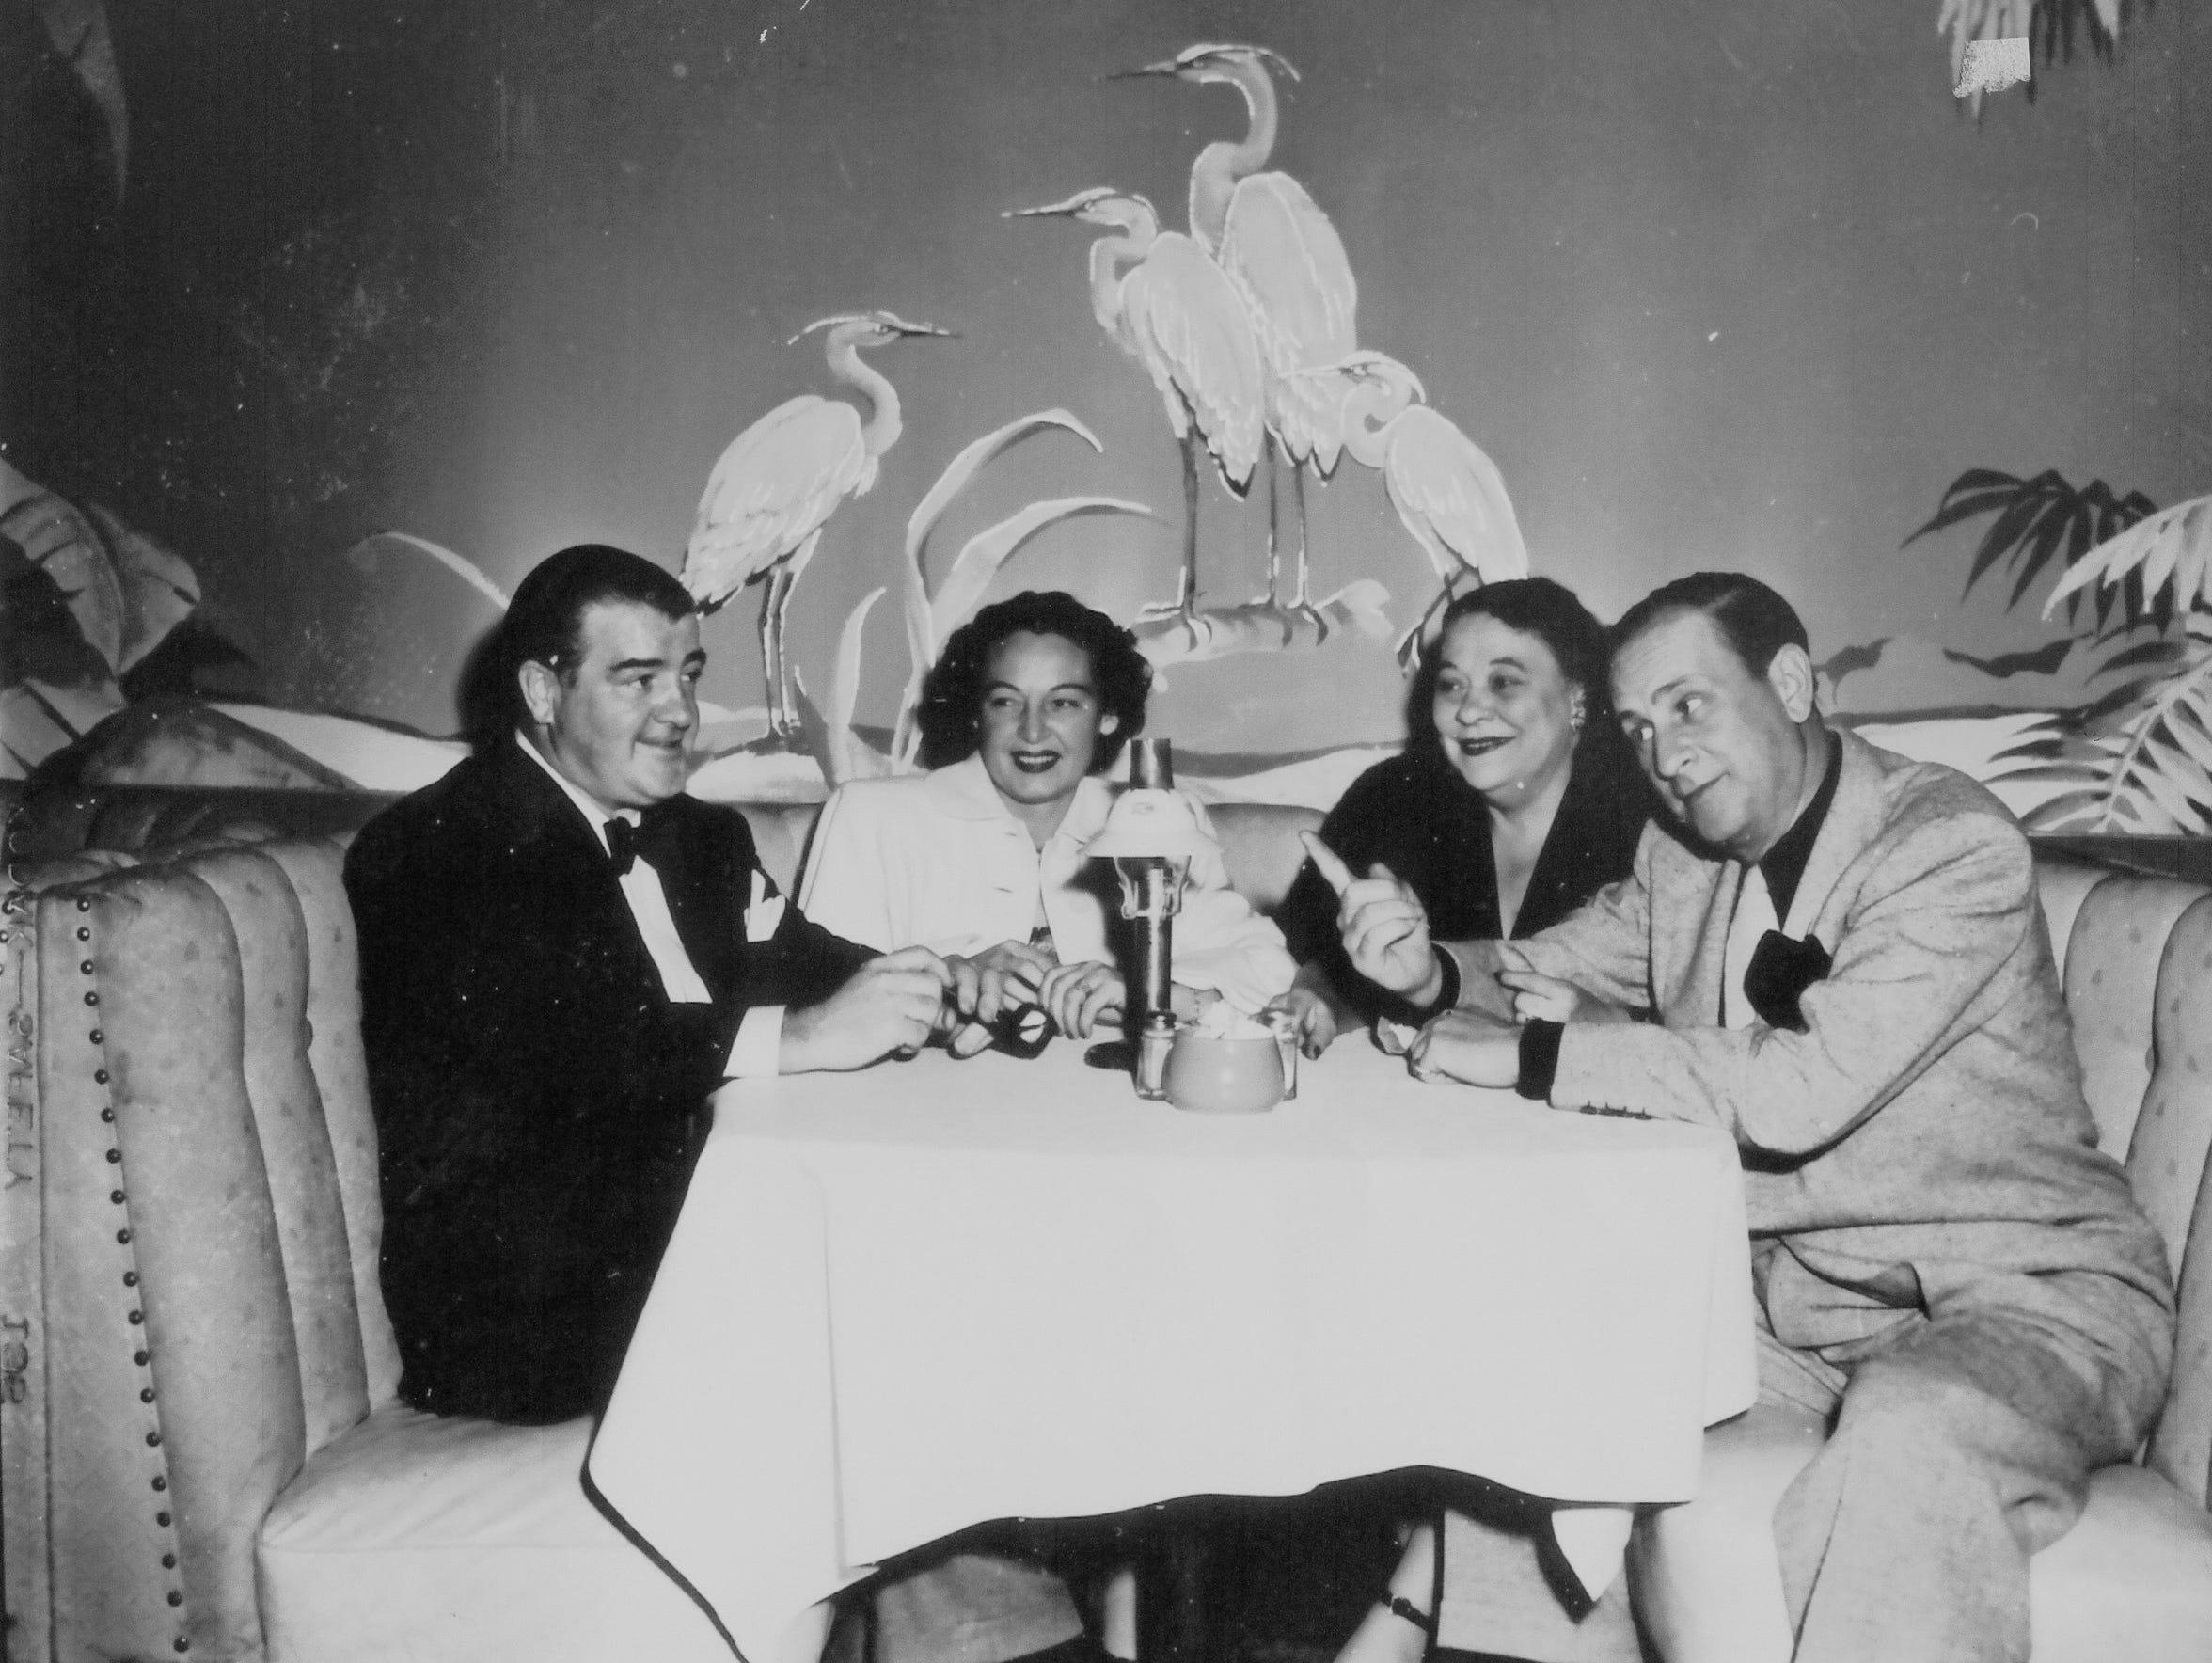 Lou Costello (far left) and Bud Abbott (far left) at